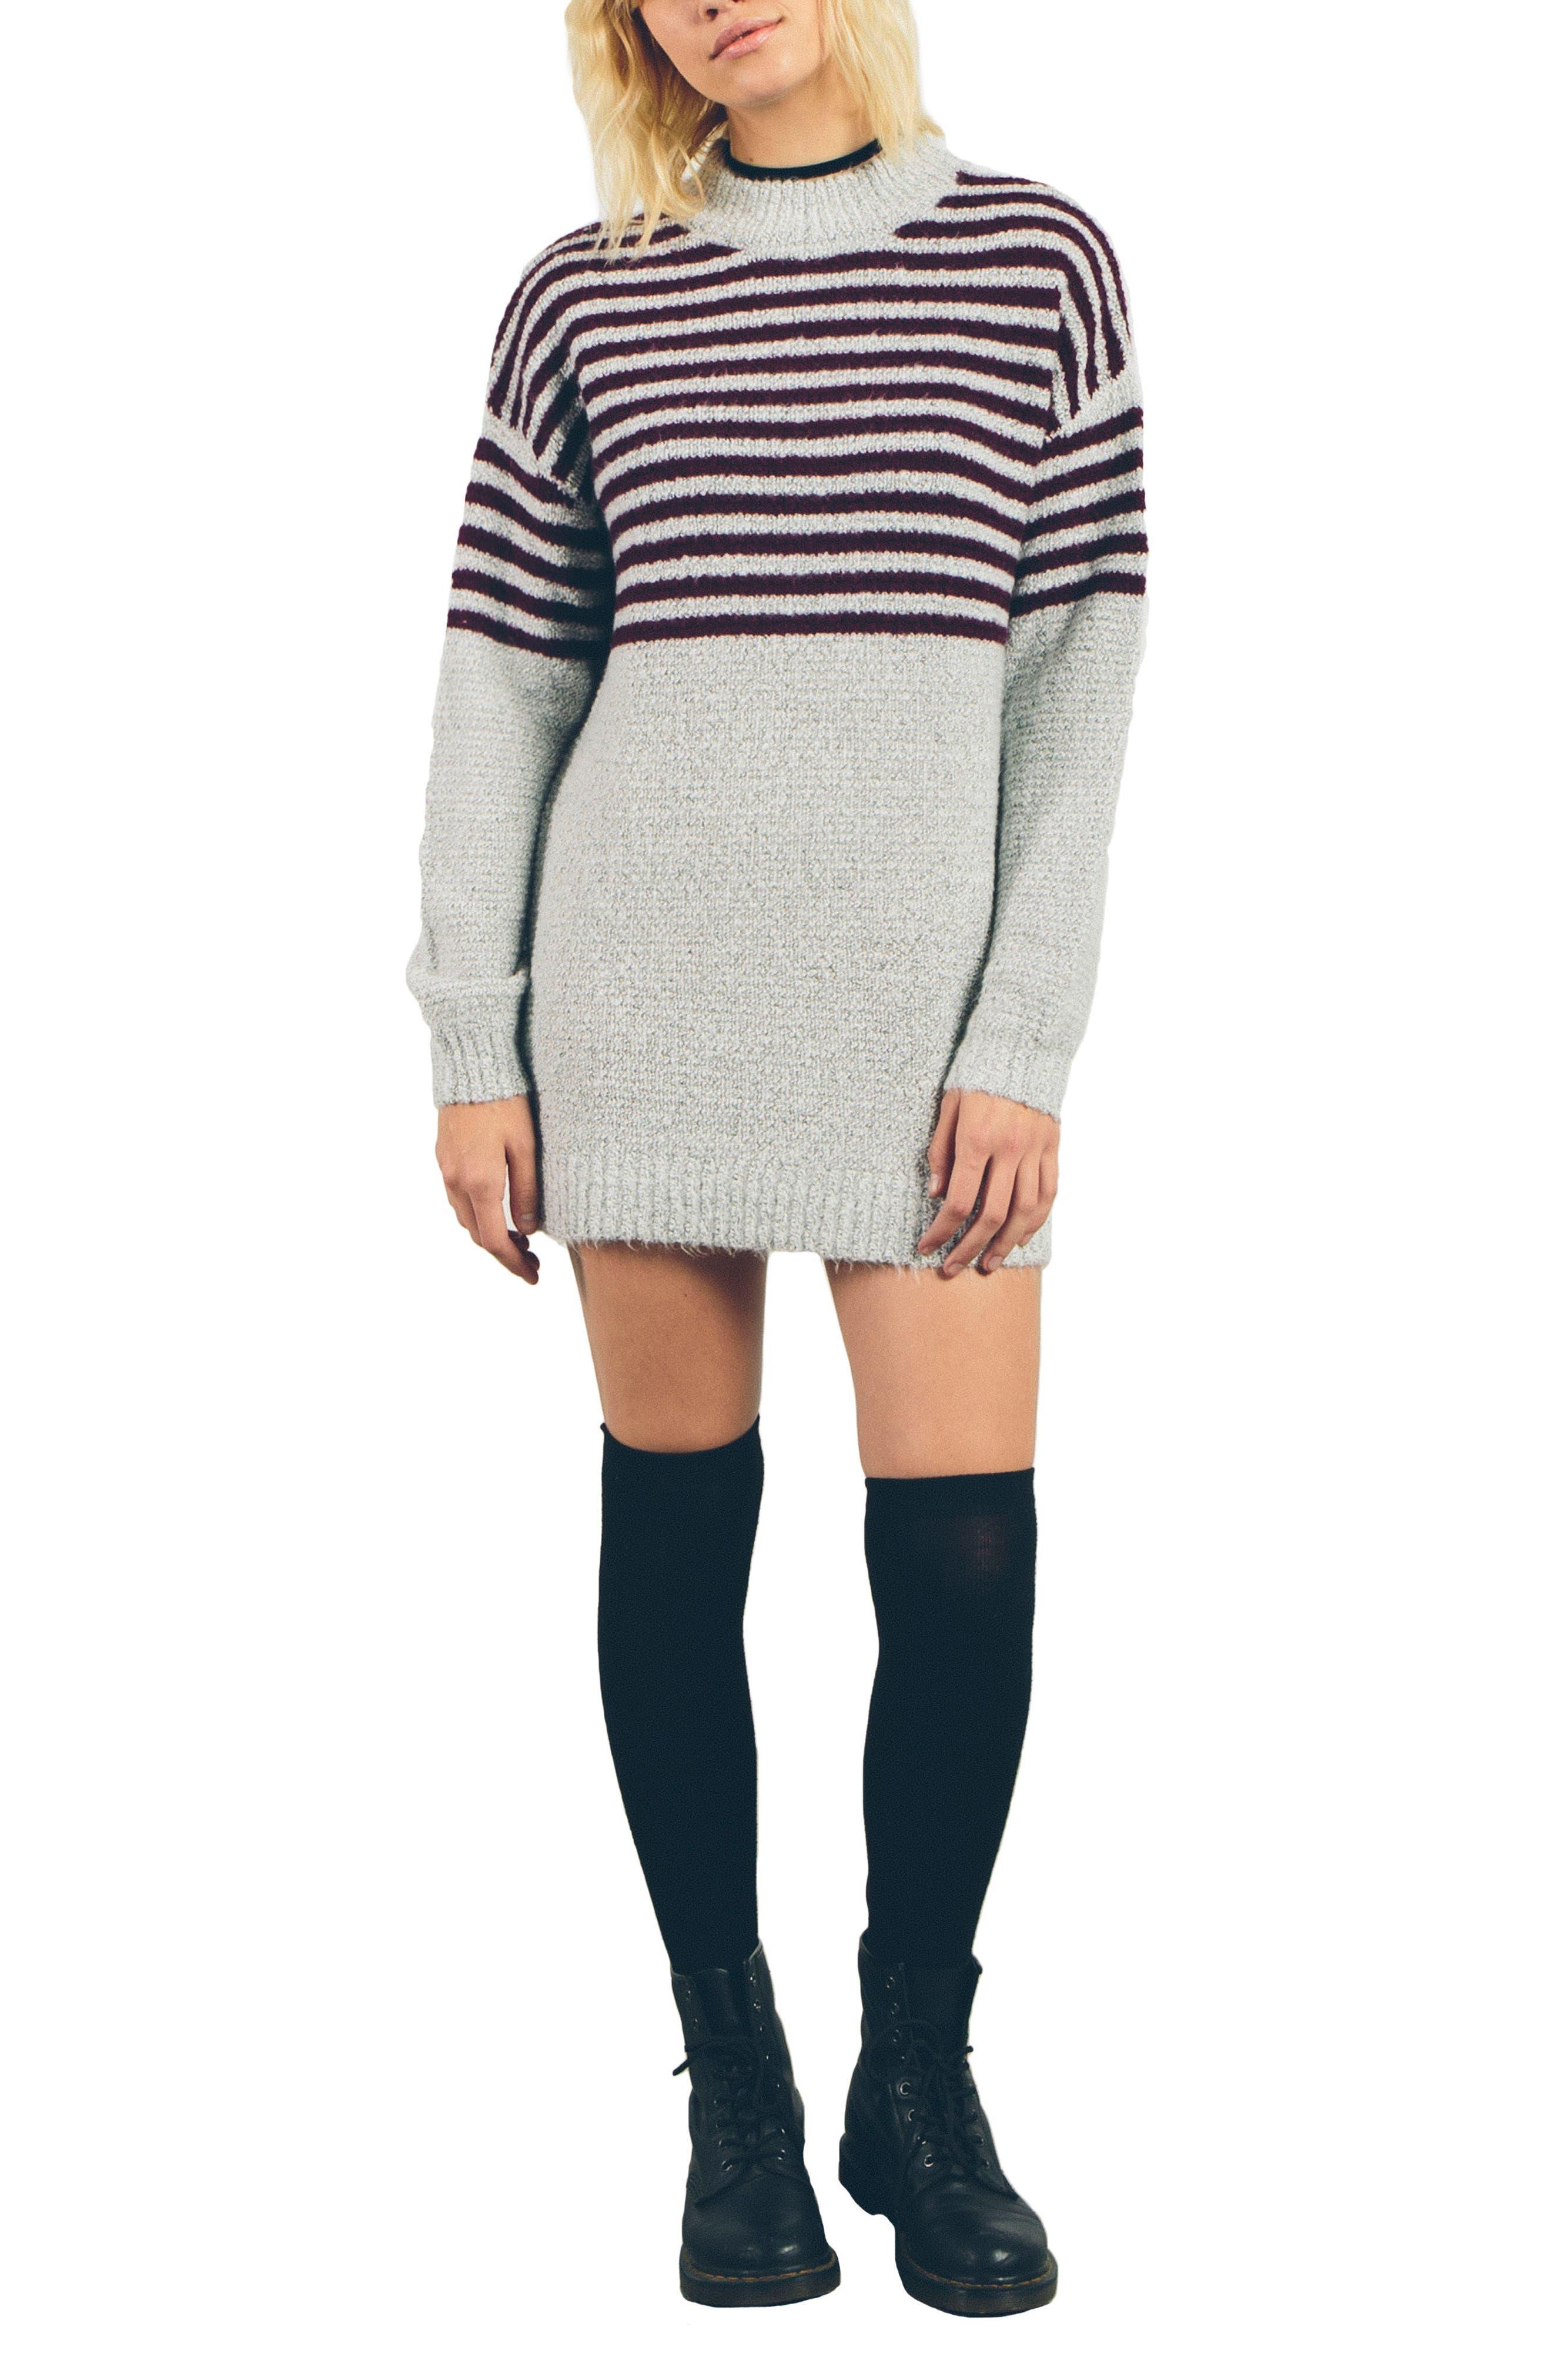 Cold Daze Knit Dress,                             Main thumbnail 1, color,                             Heather Grey